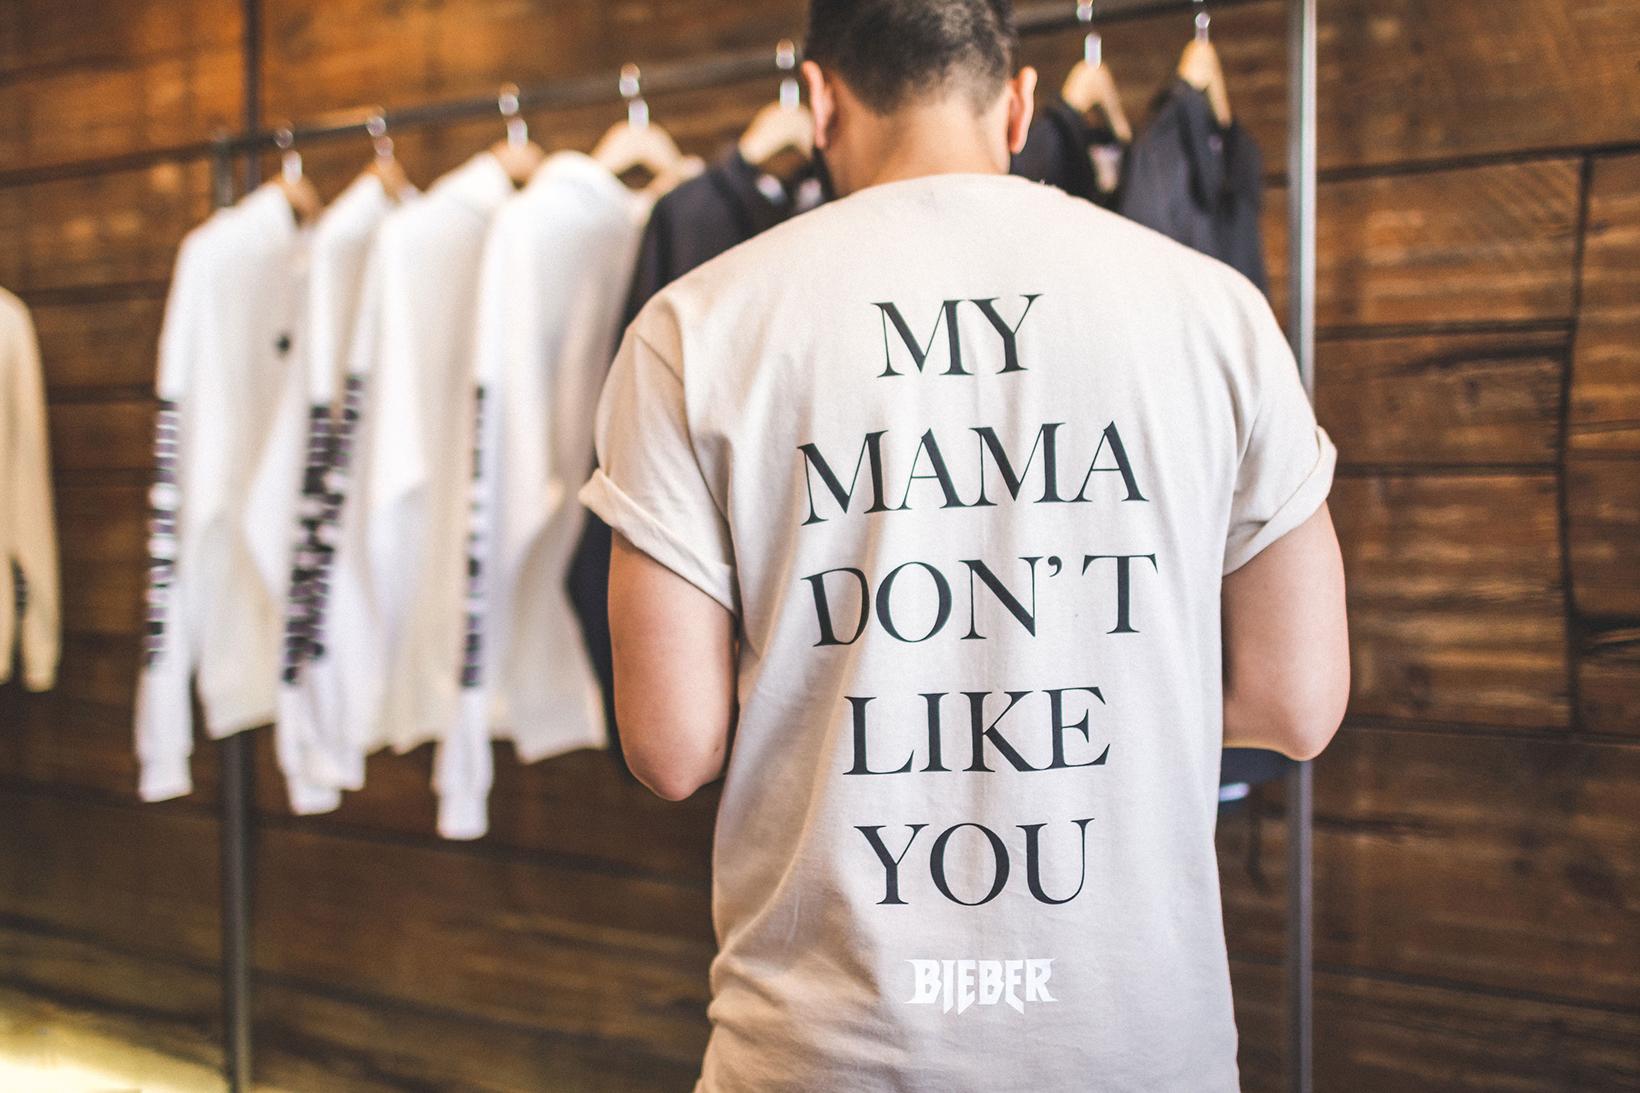 Justin Bieber Purpose Tour Merchandise available at PacSun - 1766376